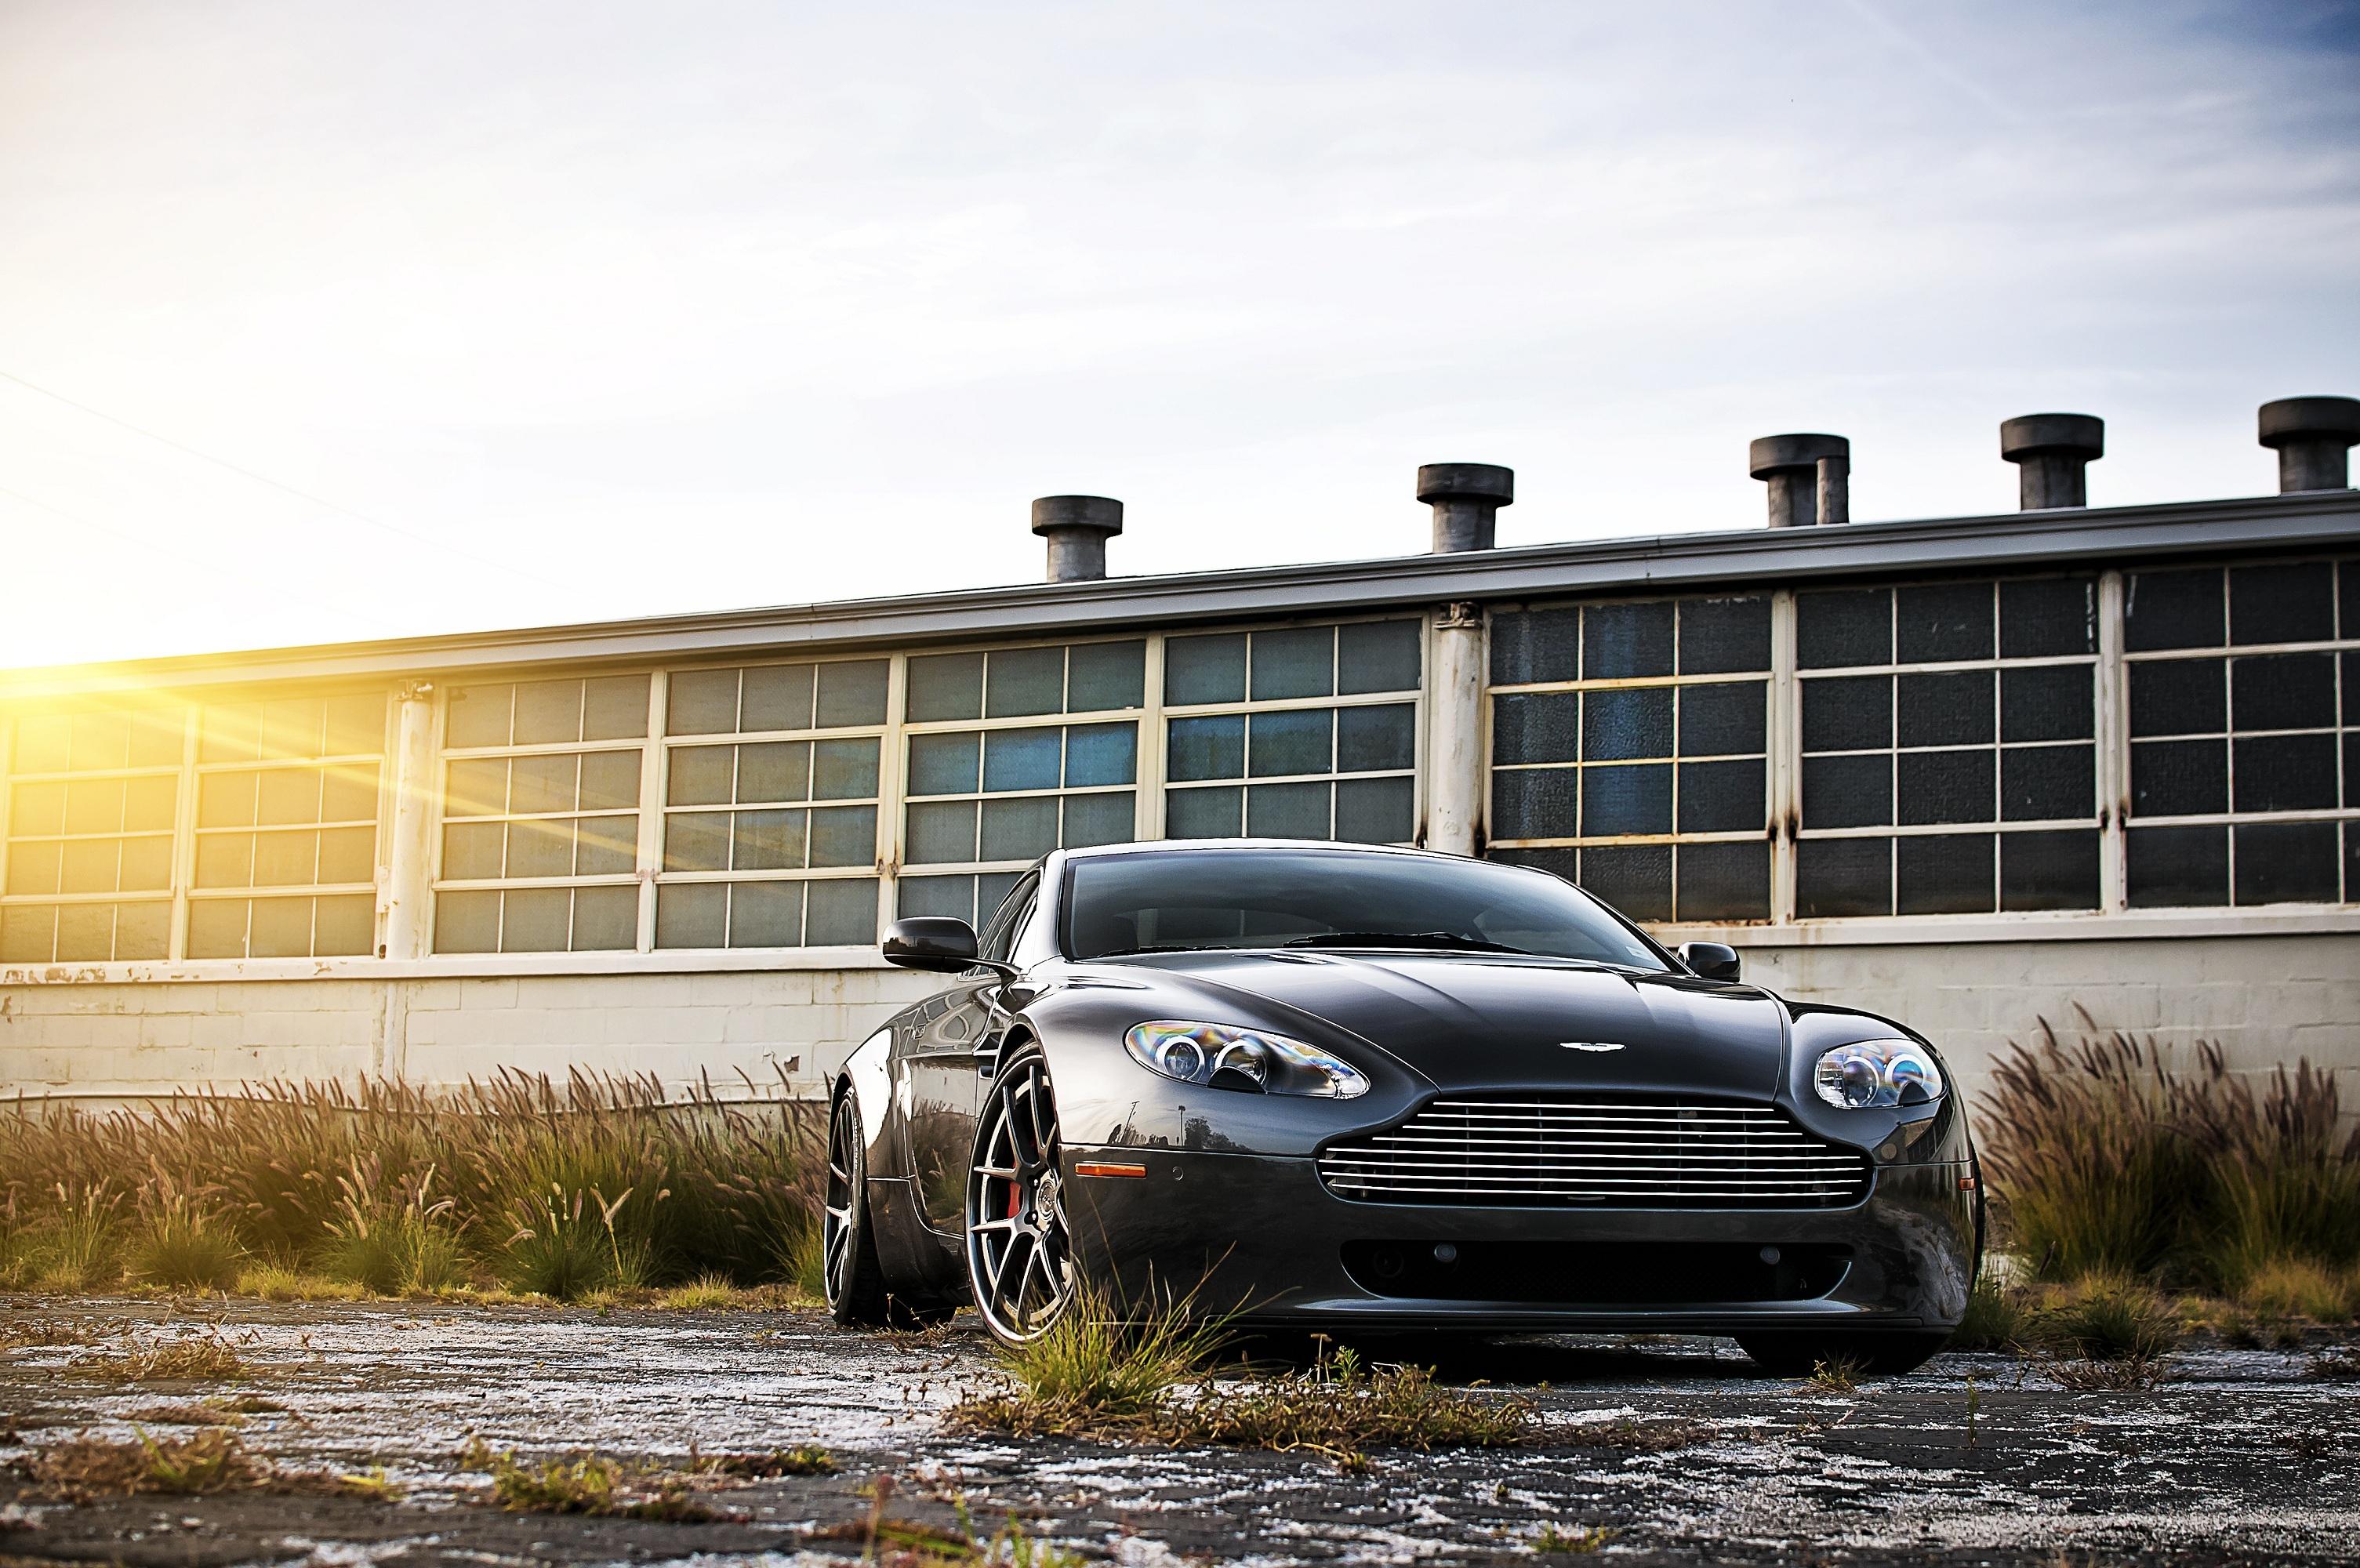 Aston Martin суперкар ночь город  № 2374847 бесплатно